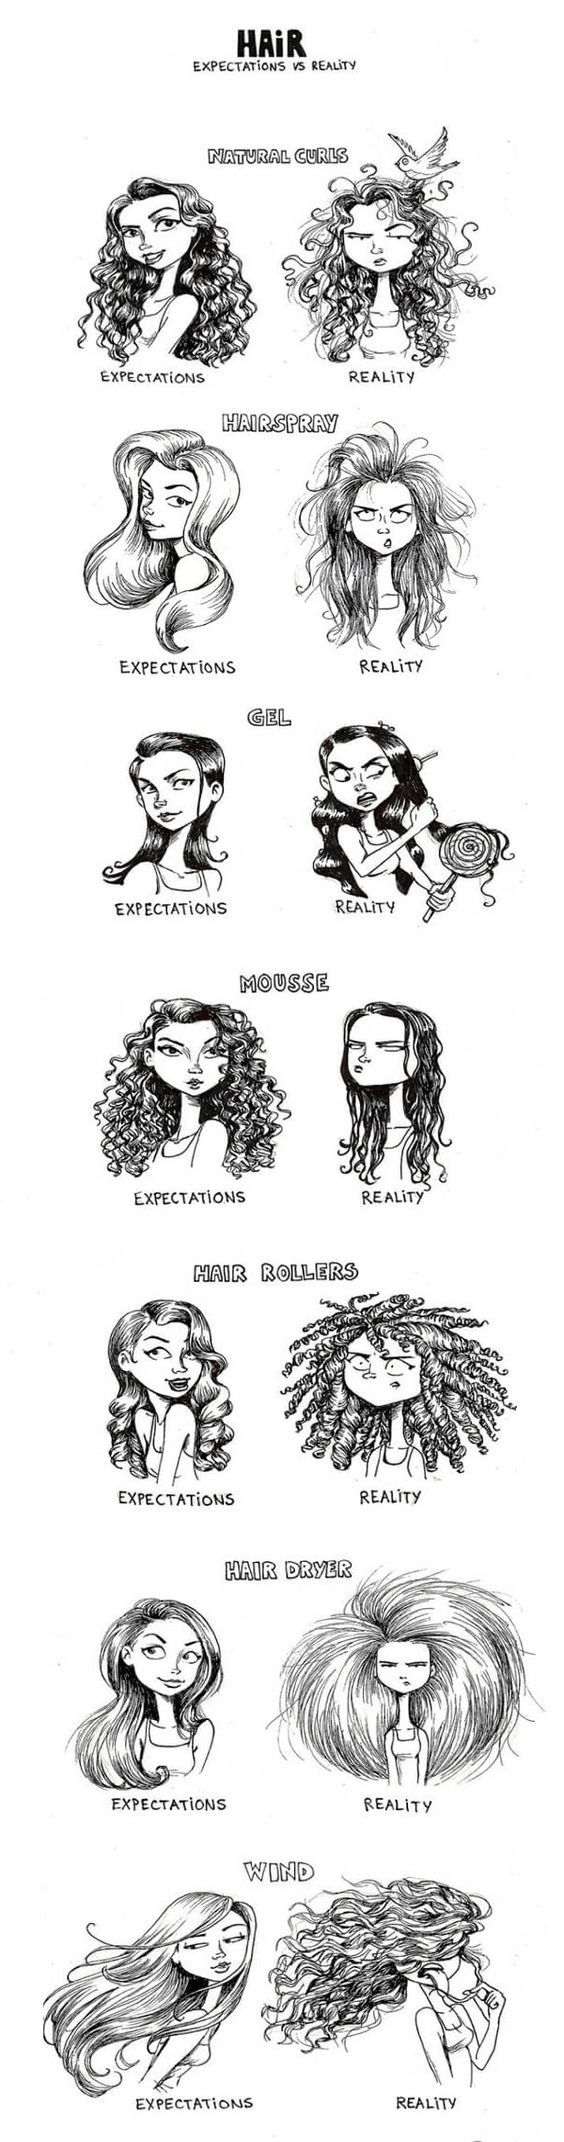 Womens Hair: Expectations Vs Reality